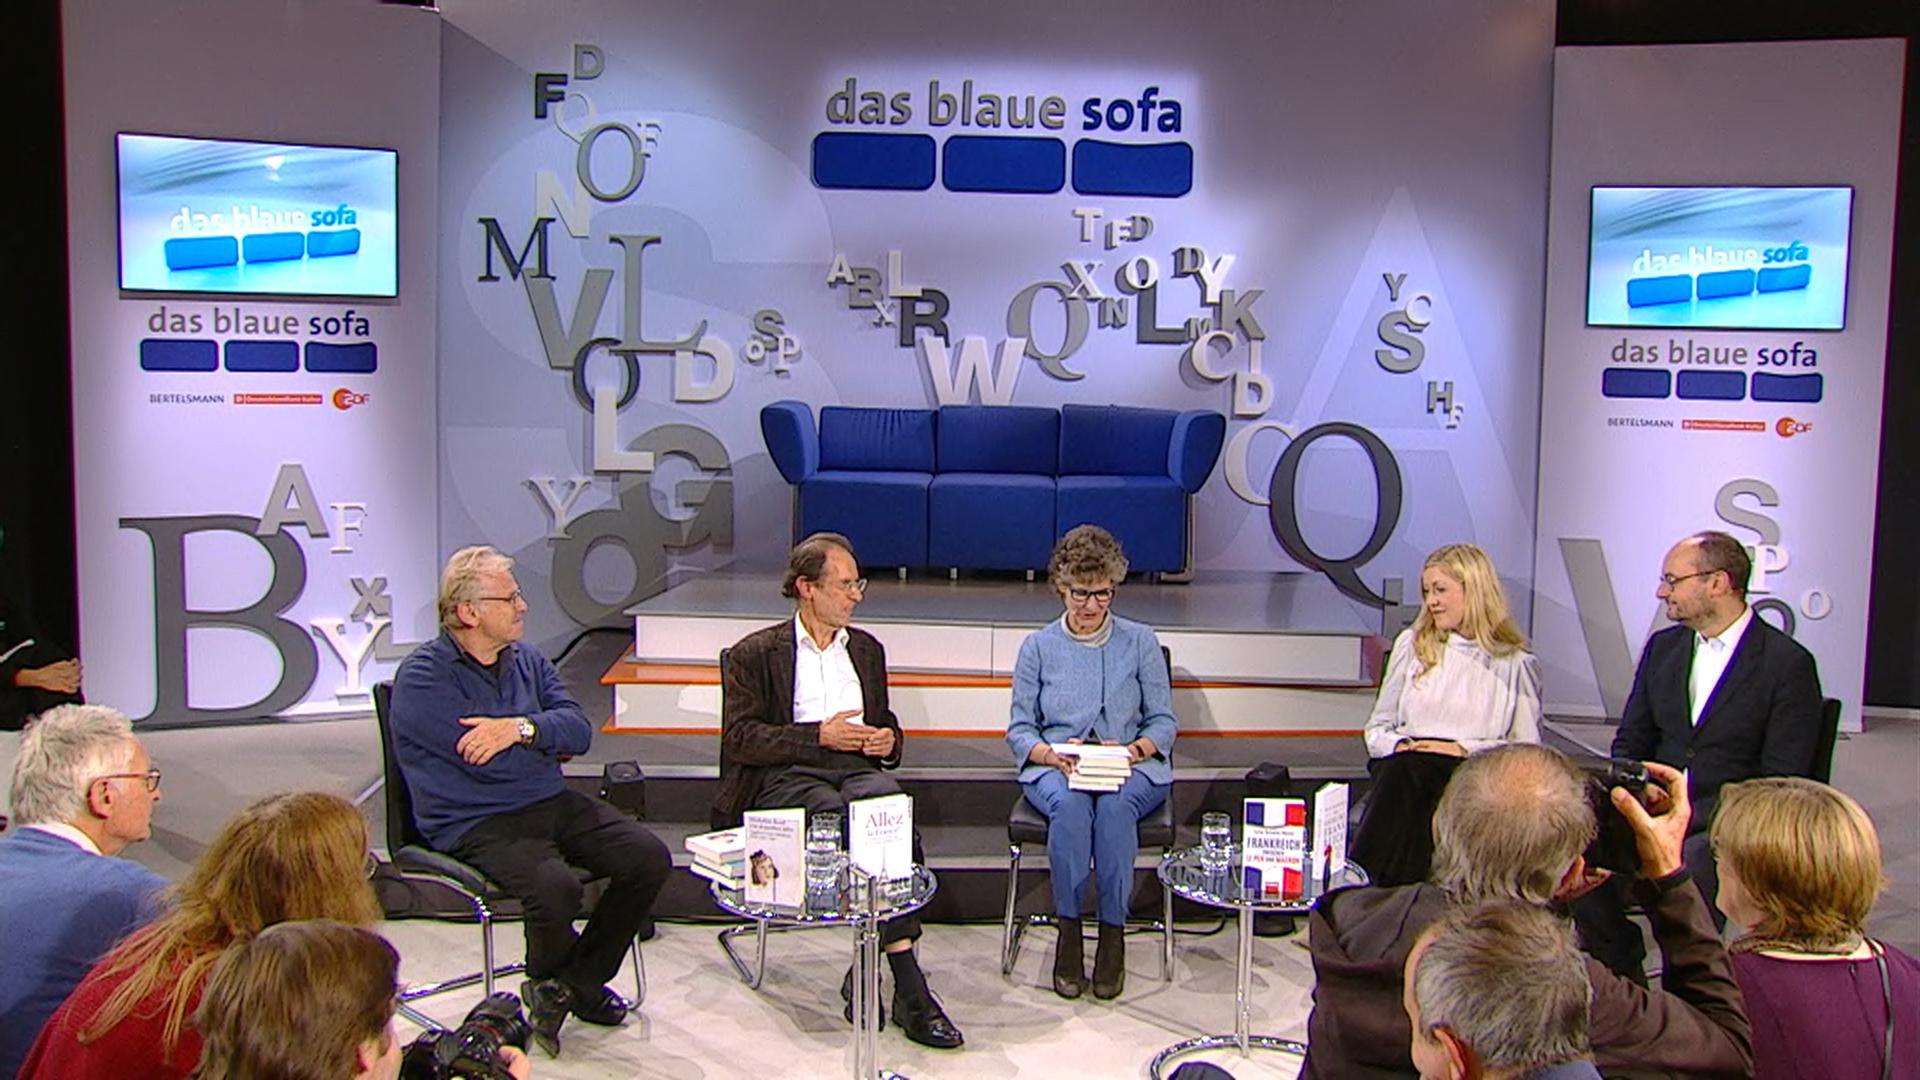 Das blaue Sofa - ZDFmediathek